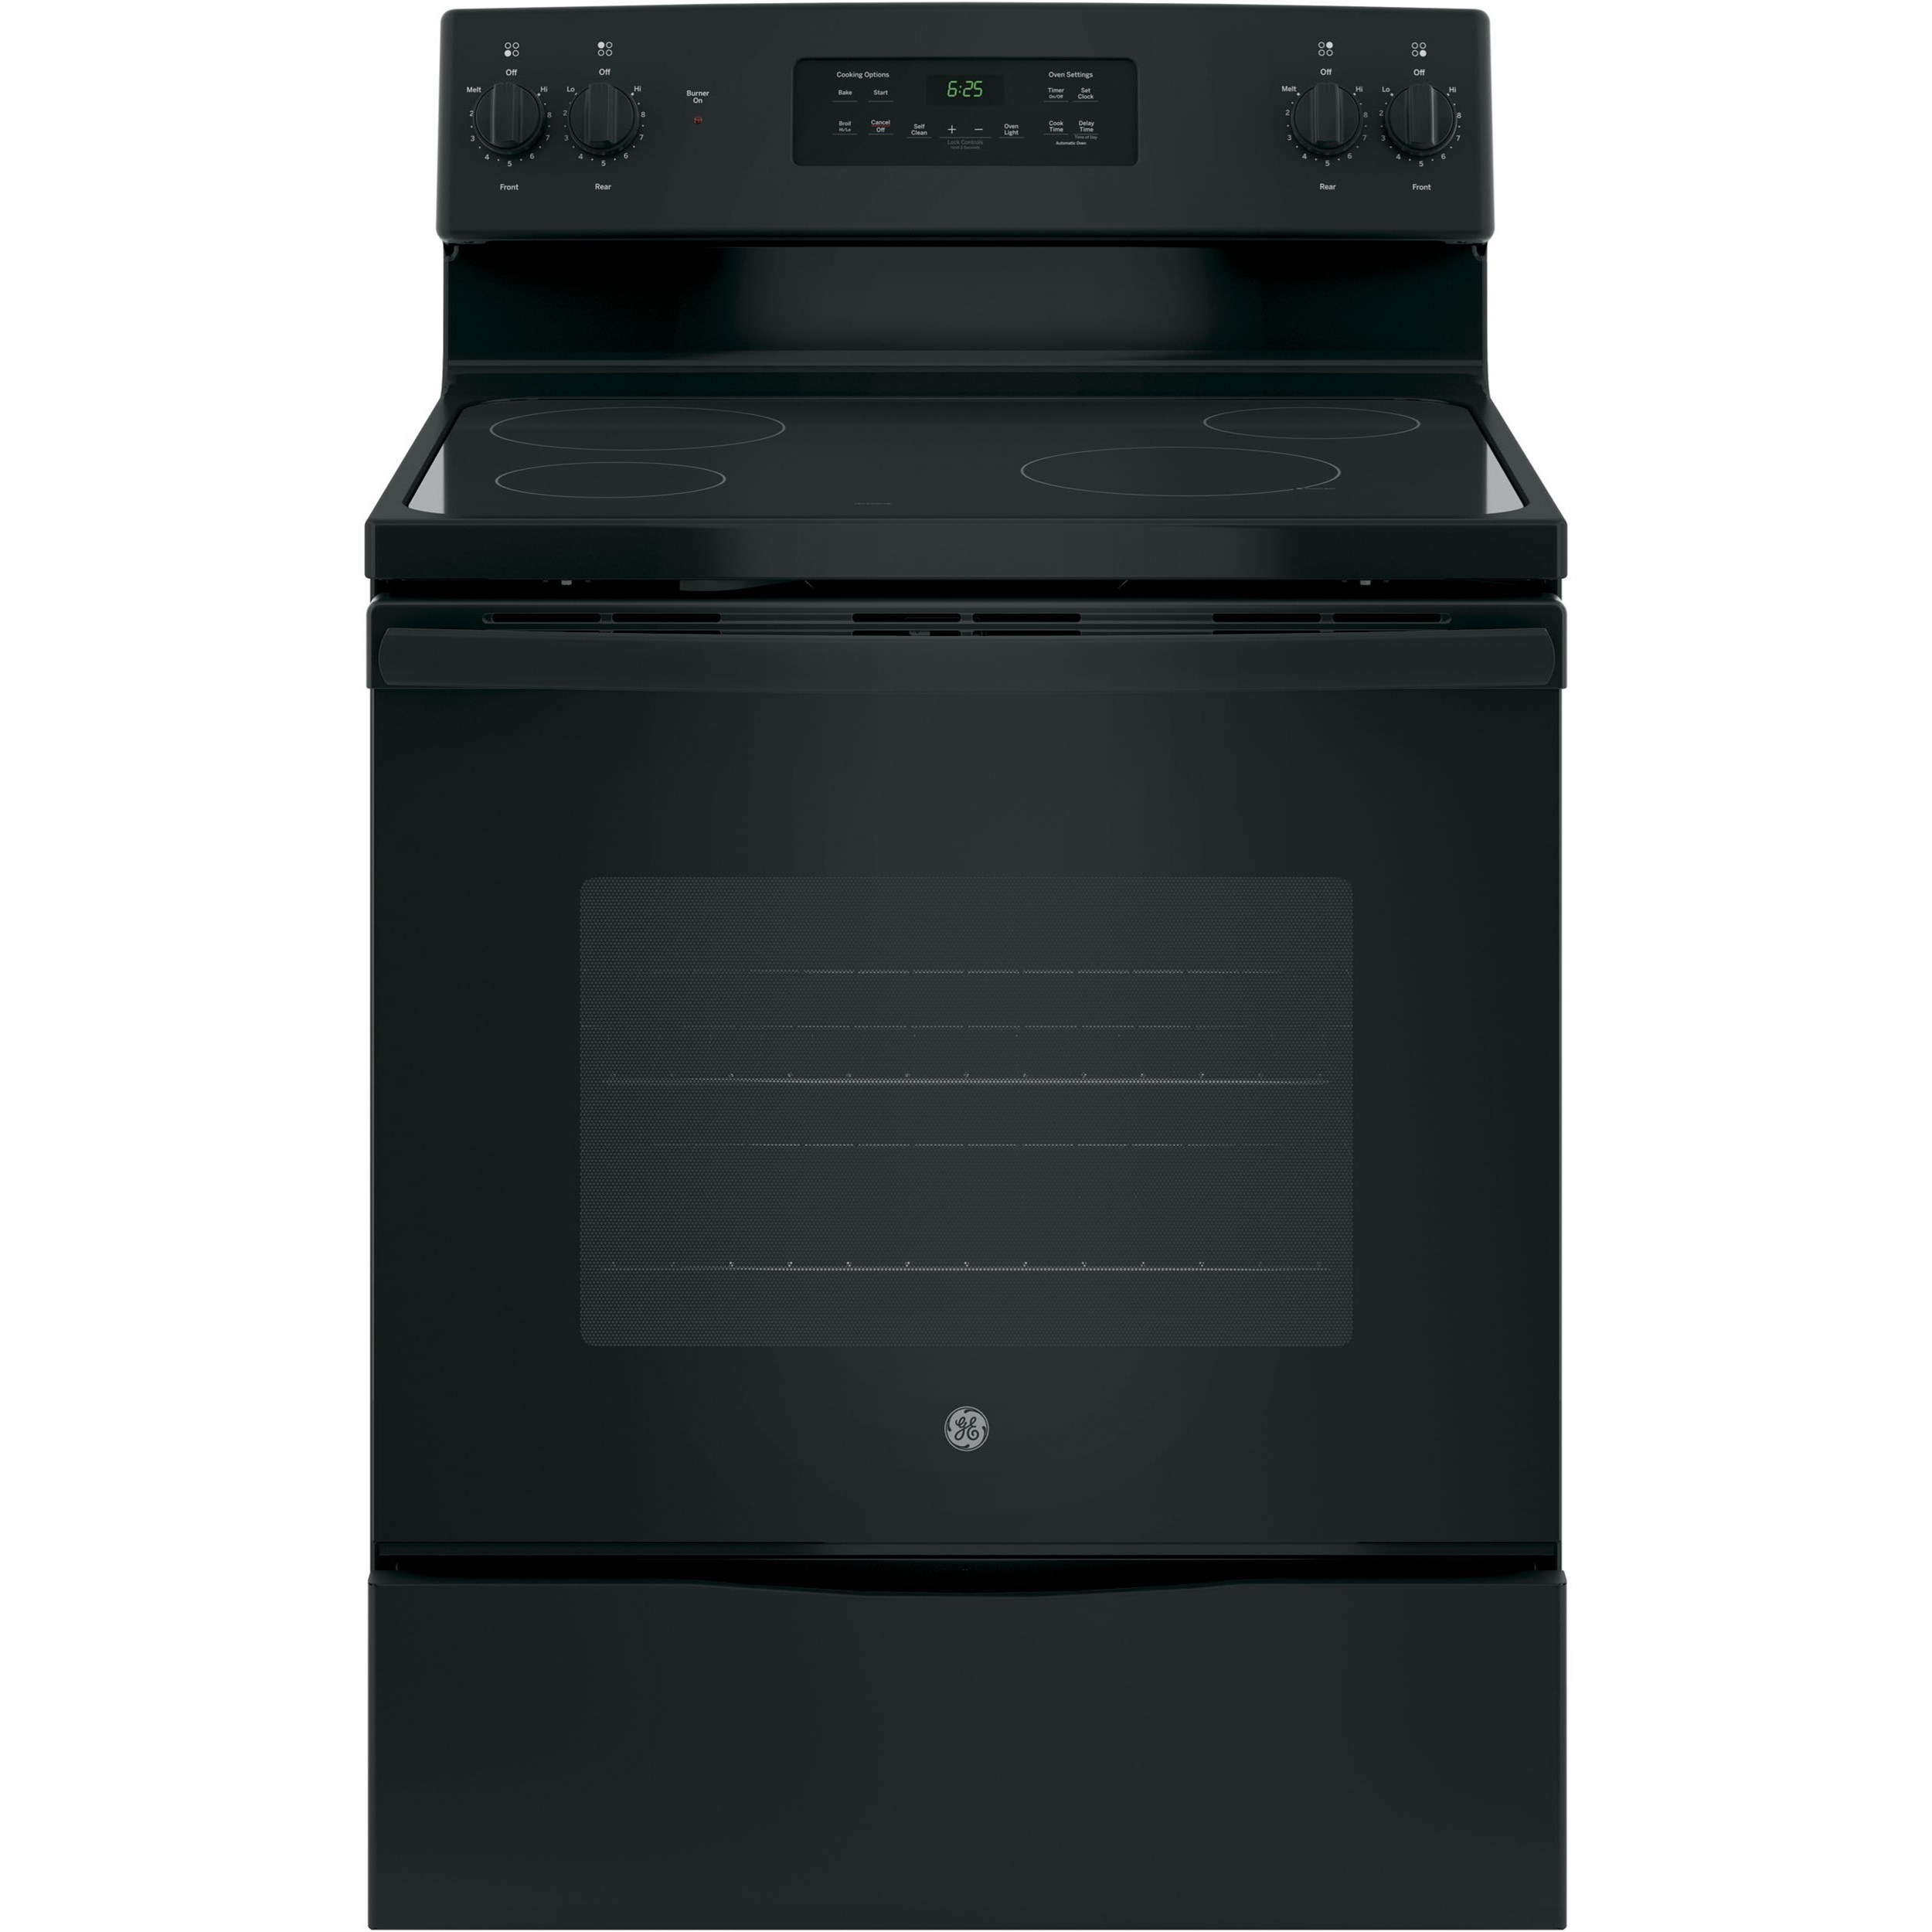 "GE Appliances GE Electric Ranges GE® 30"" Free-Standing Electric Range - Item Number: JB625DKBB"